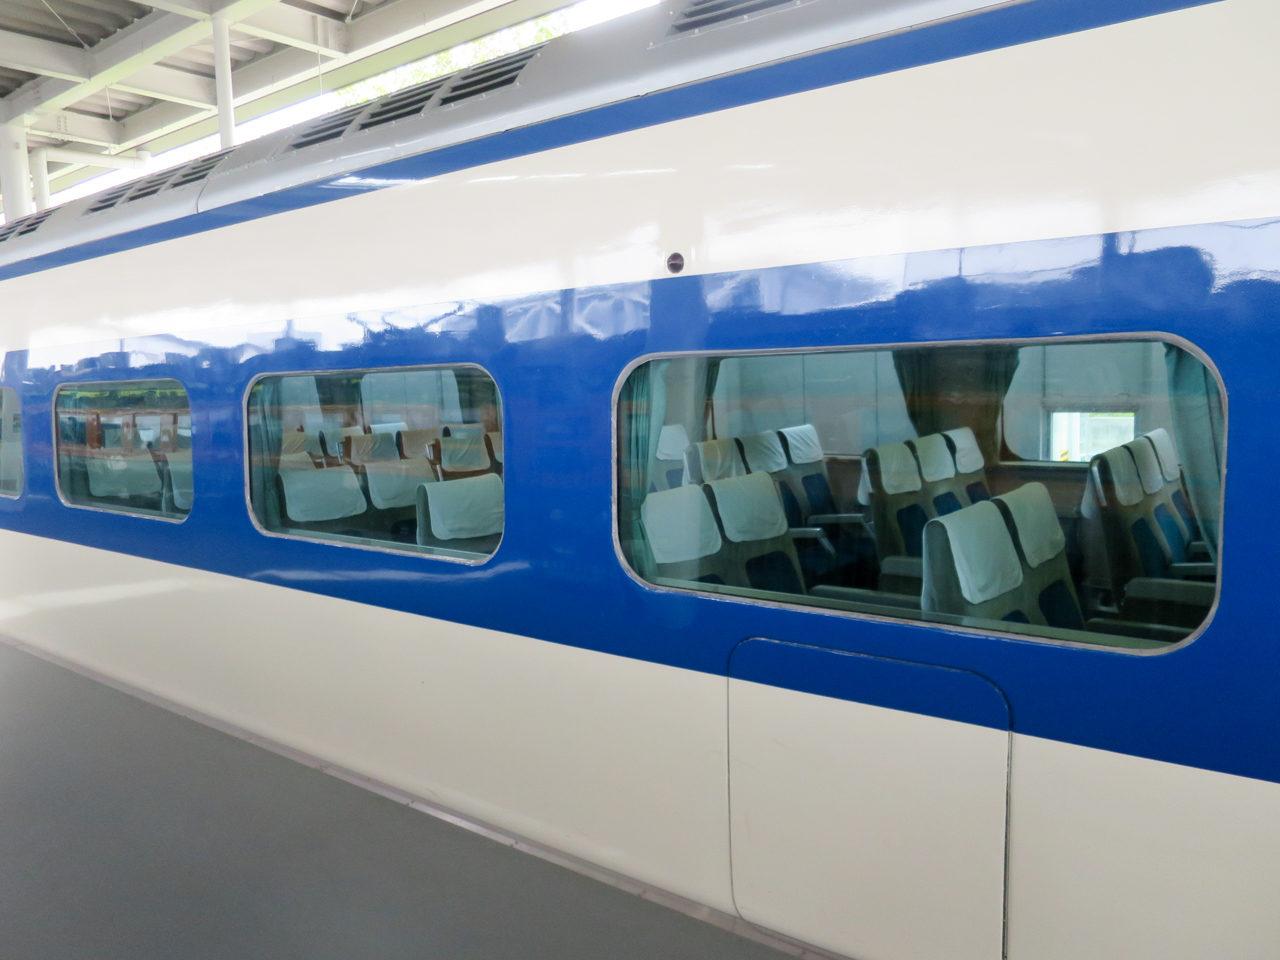 京都鉄道博物館の新幹線0系